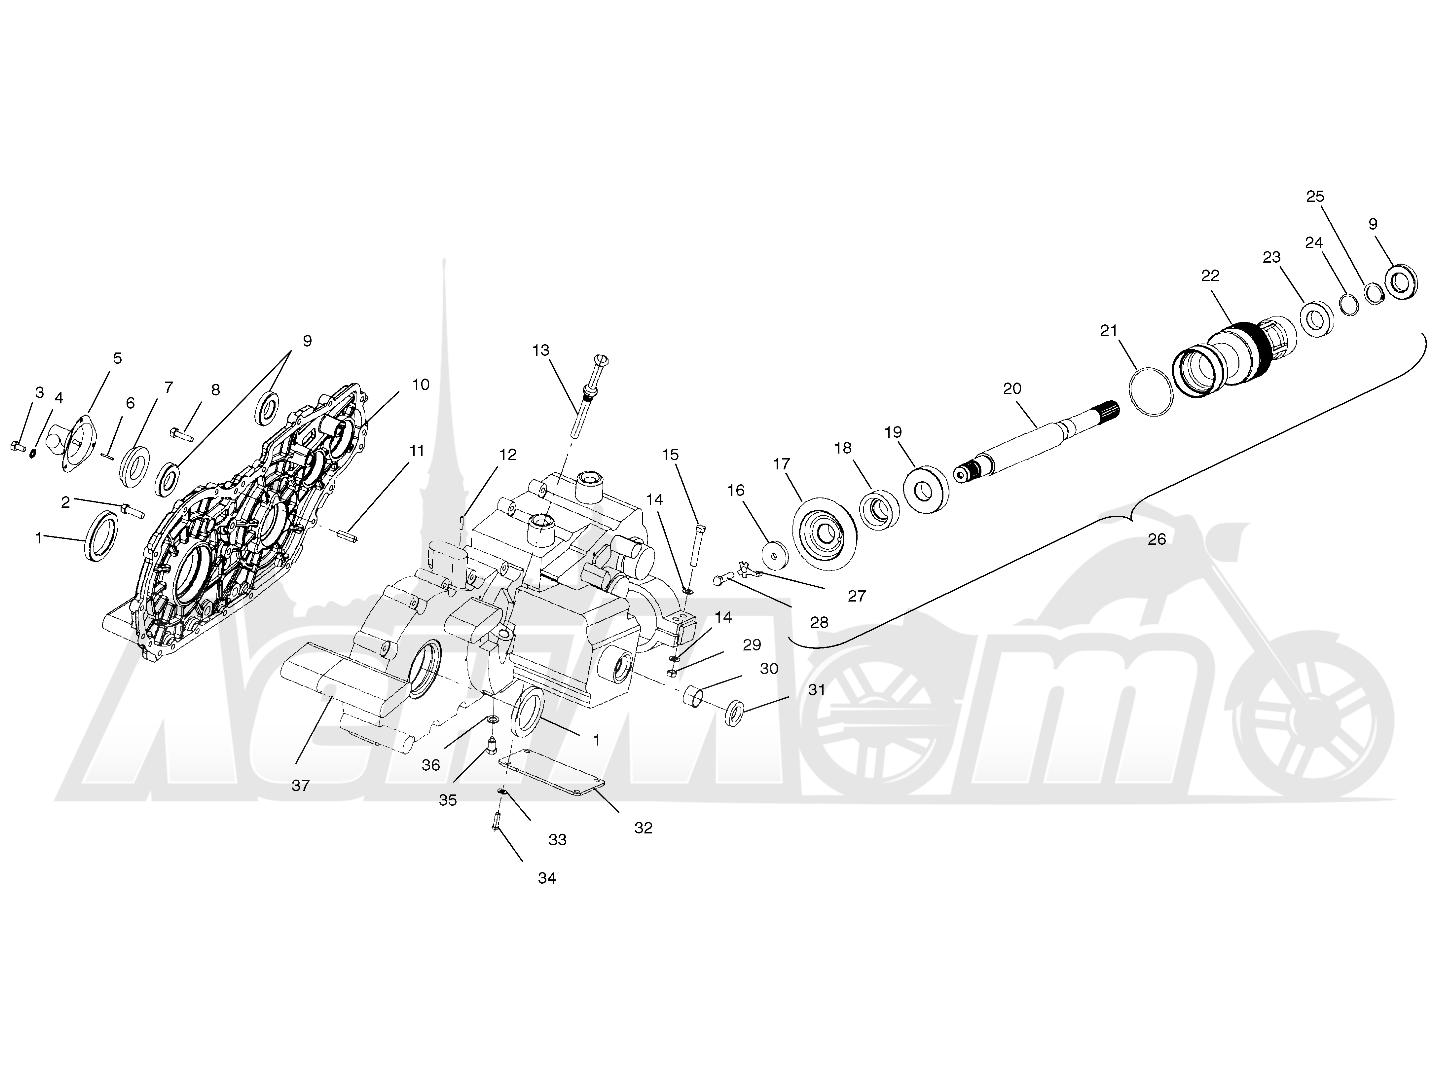 Запчасти для Квадроцикла Polaris 1997 SWEDISH SPORTSMAN 50 - S97CH50E Раздел: GEARCASE (CASES AND SNORKEL) - W97CH50A   коробка передач (CASES и шноркель) W97CH50A